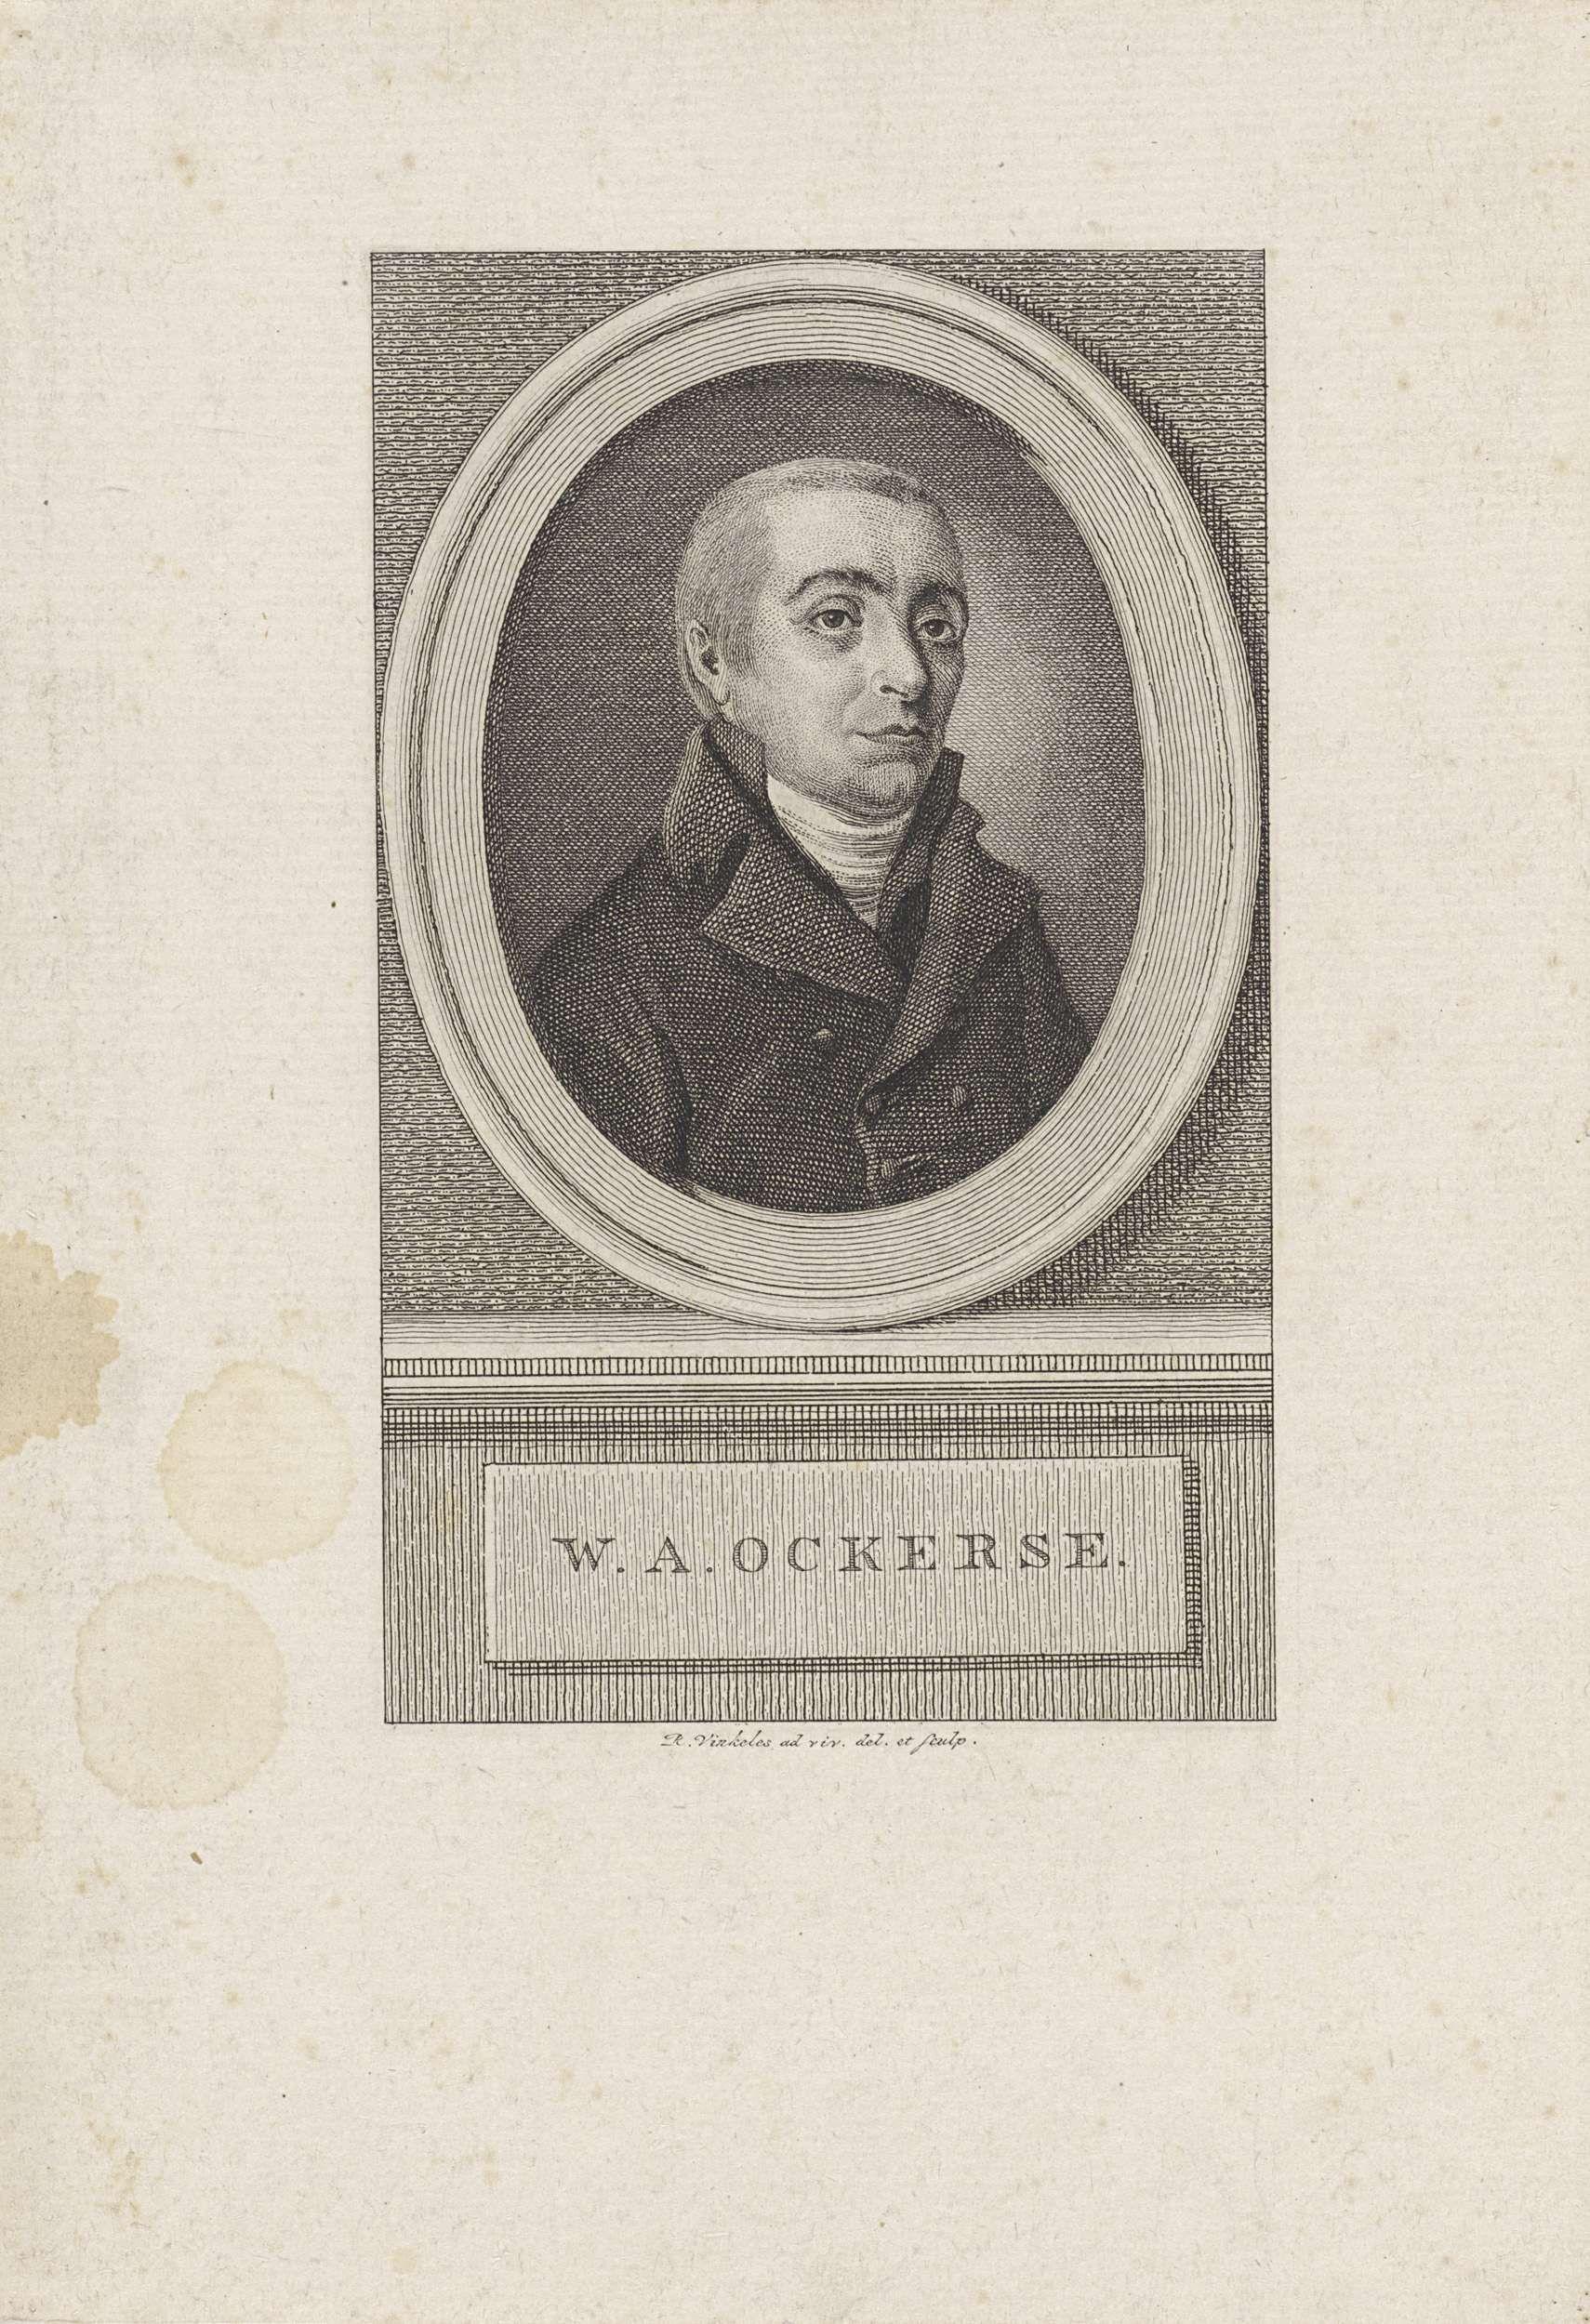 Reinier Vinkeles | Portret van Willem Anthonie Ockerse, Reinier Vinkeles, 1786 - 1809 | Portret van Willem Anthonie Ockerse, letterkundige en predikant.